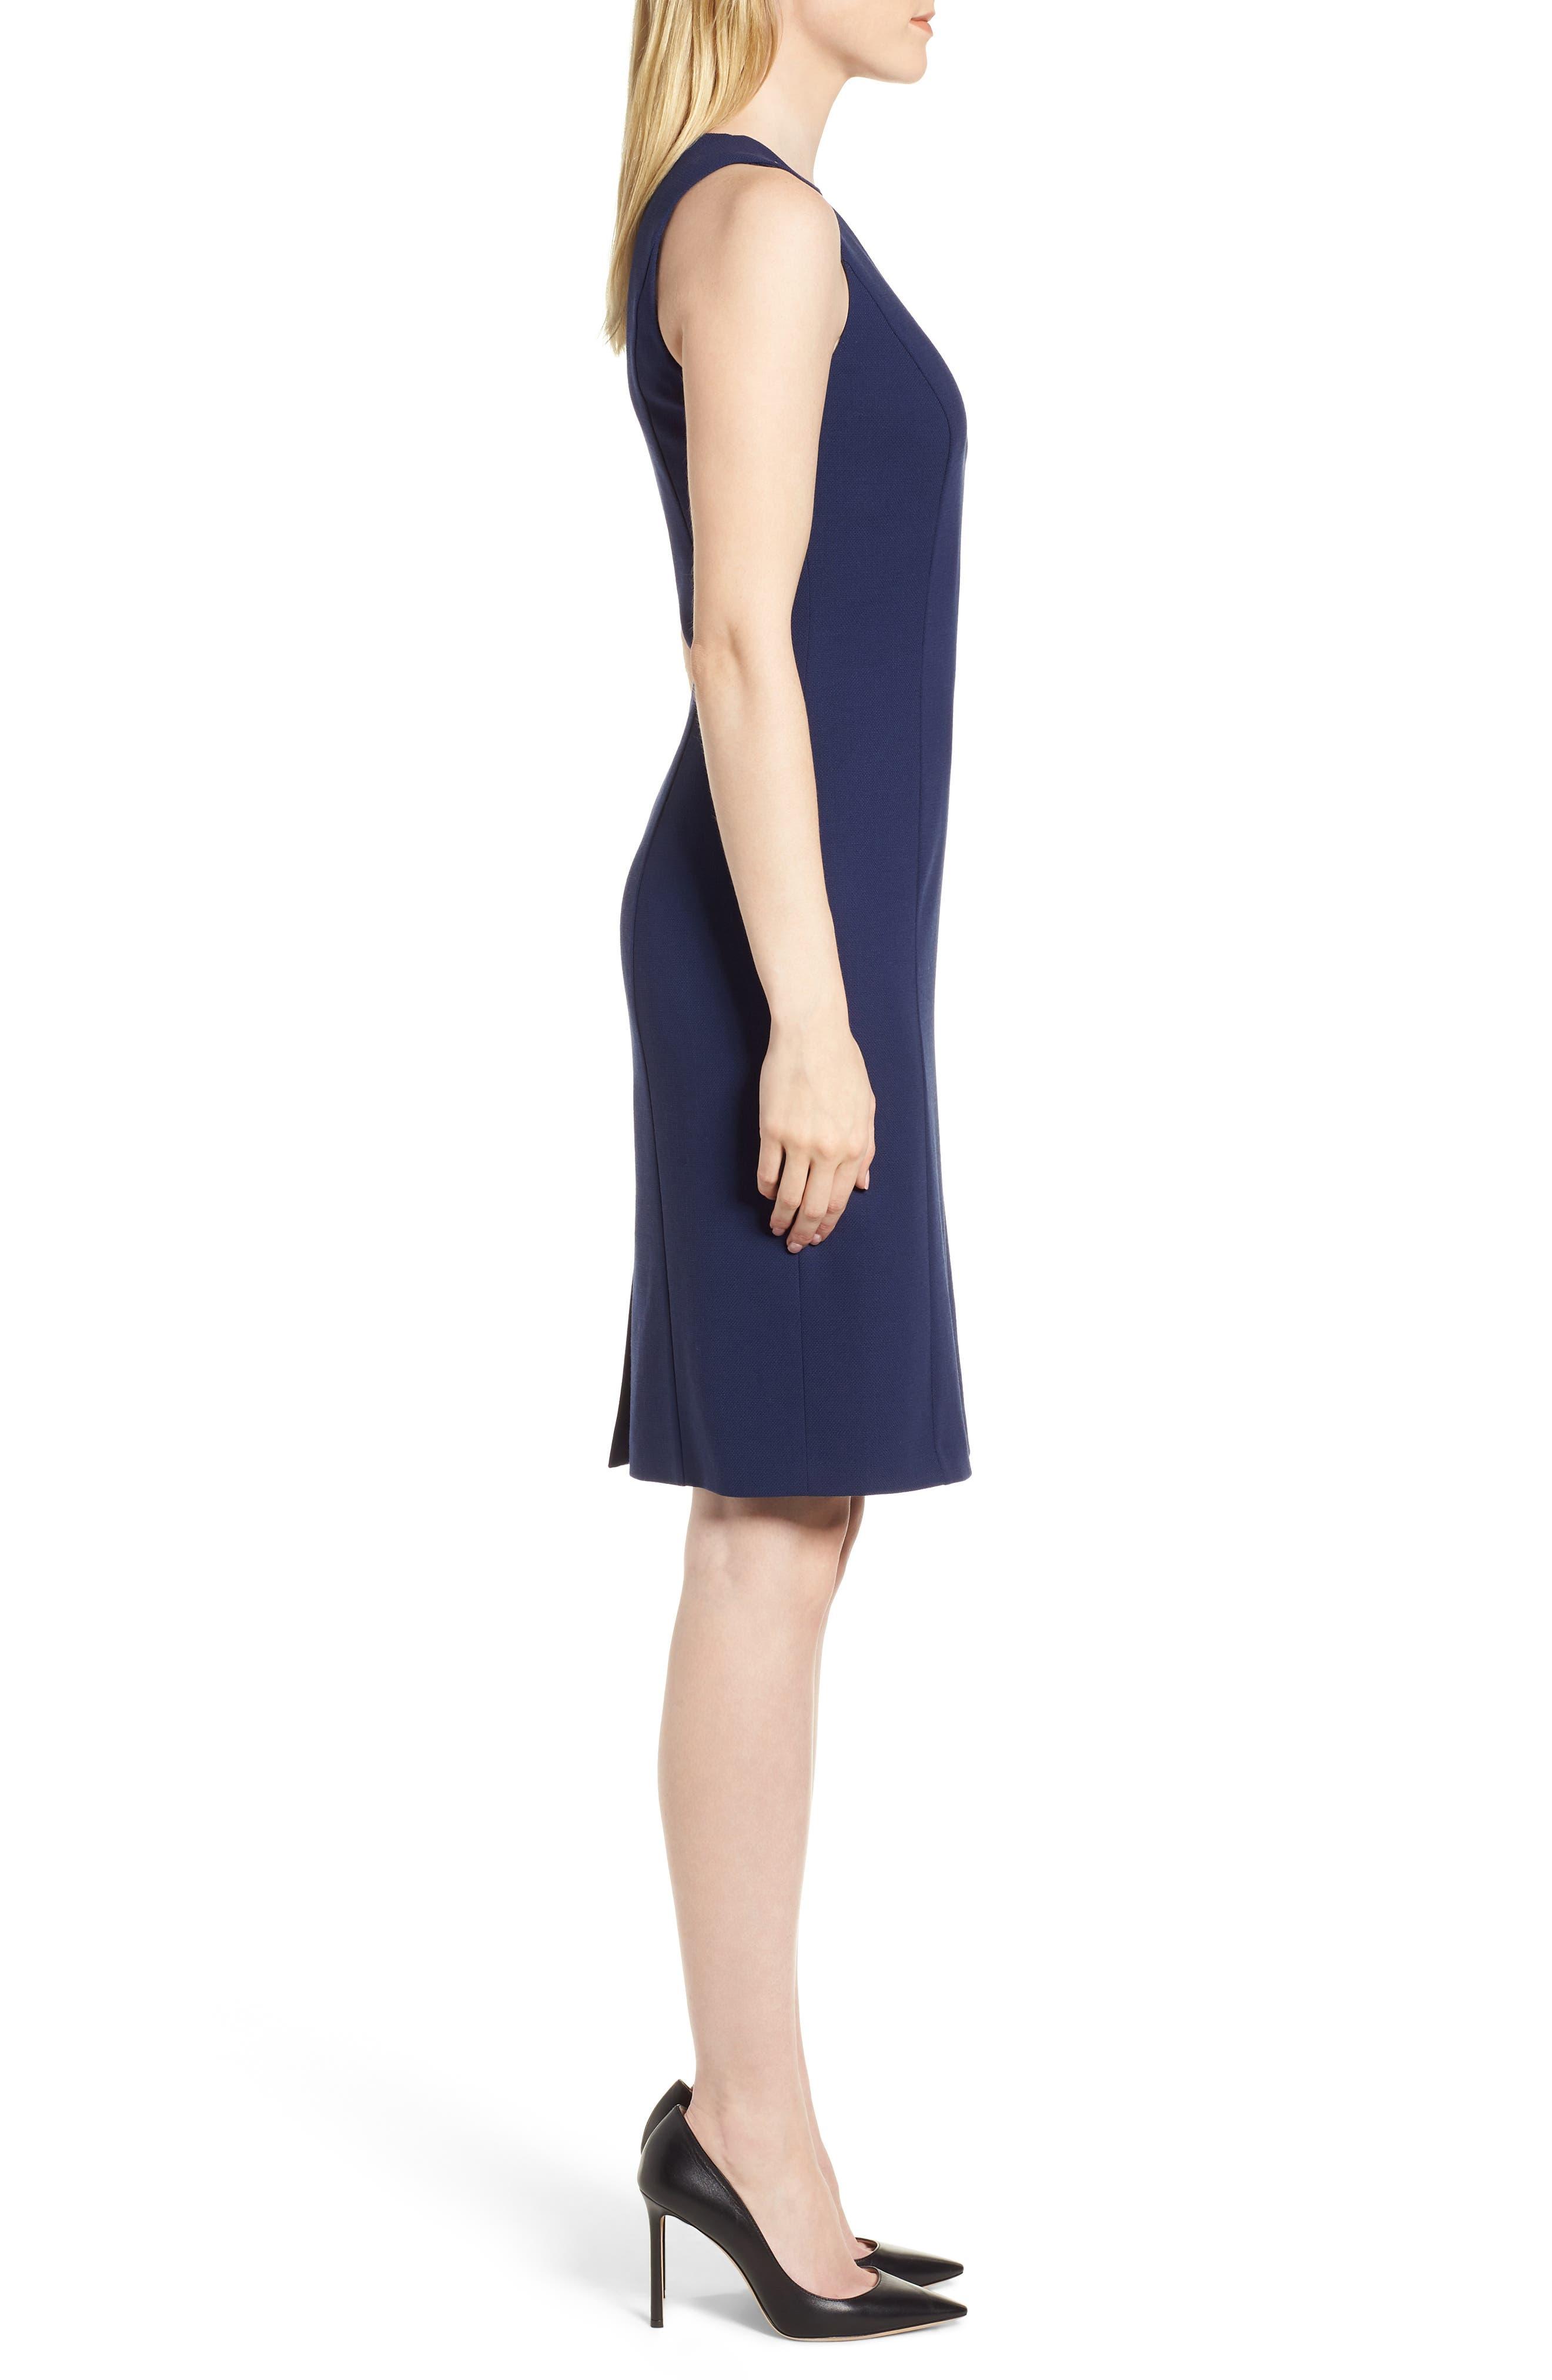 Dibalena Texture Stretch Dress,                             Alternate thumbnail 3, color,                             425